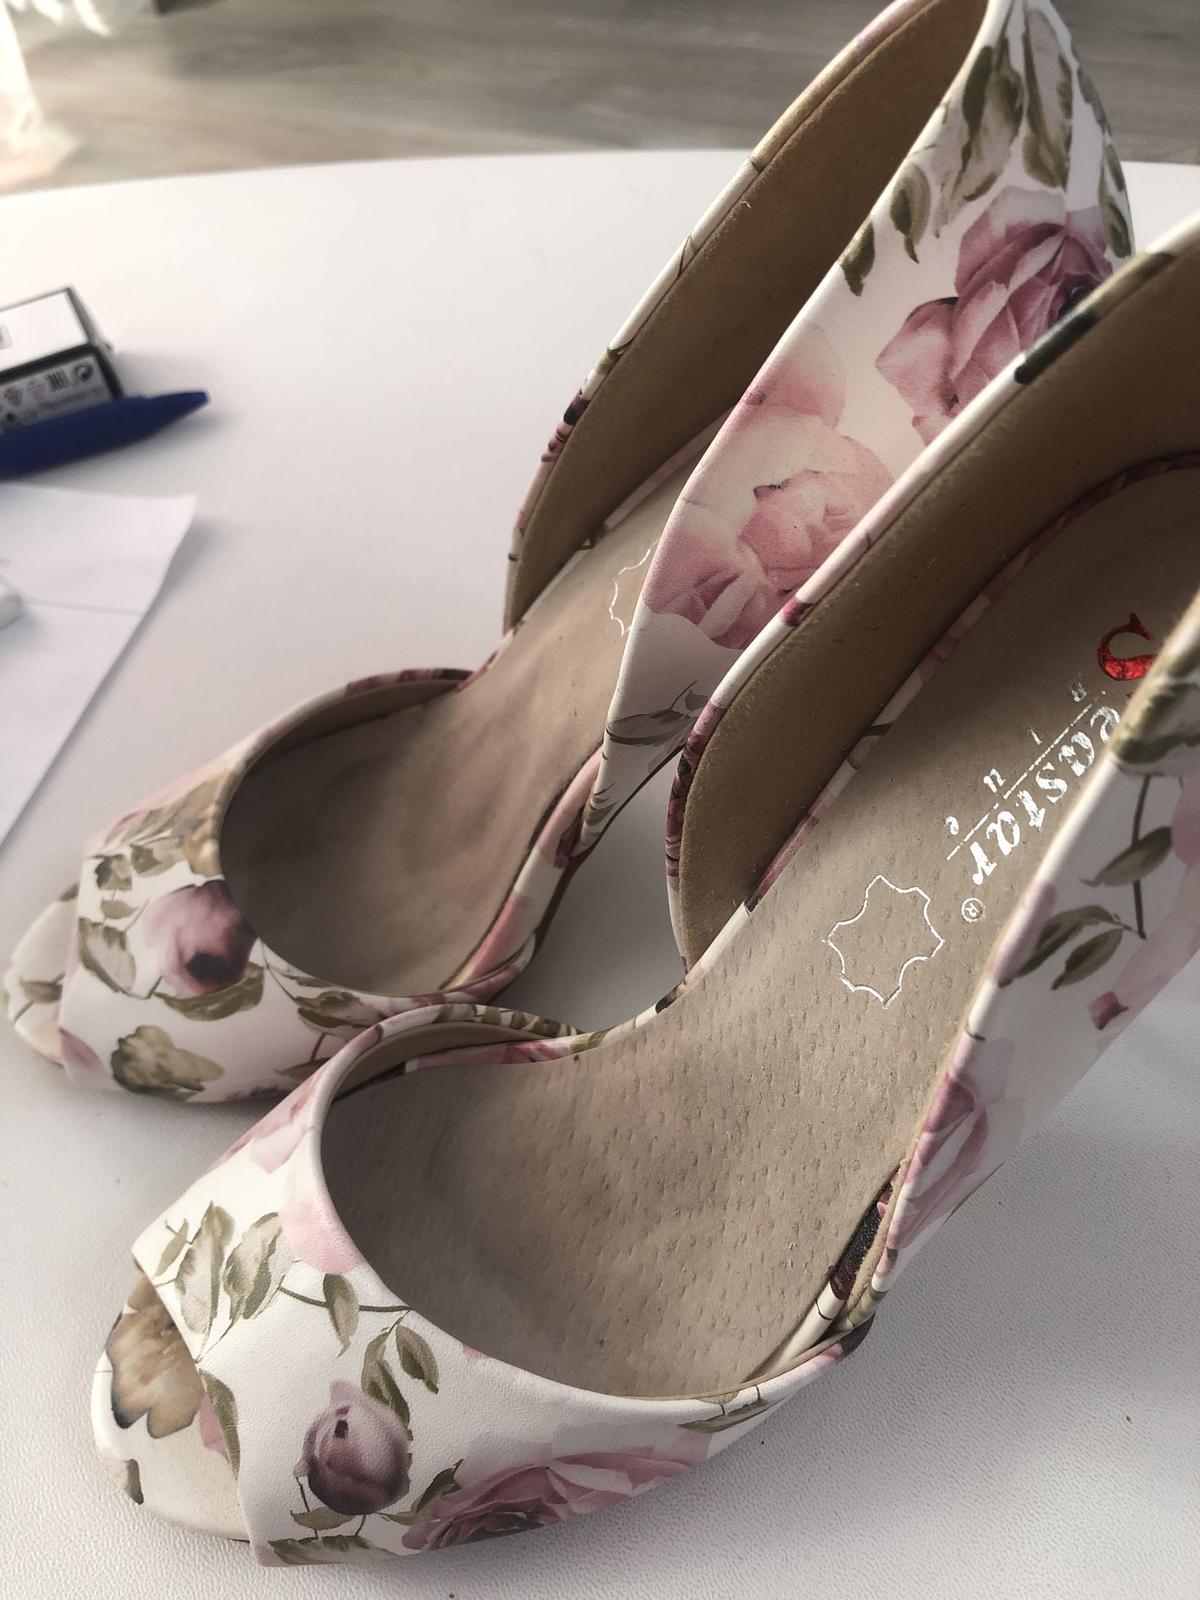 Letné sandálky s kvetmi - Obrázok č. 4